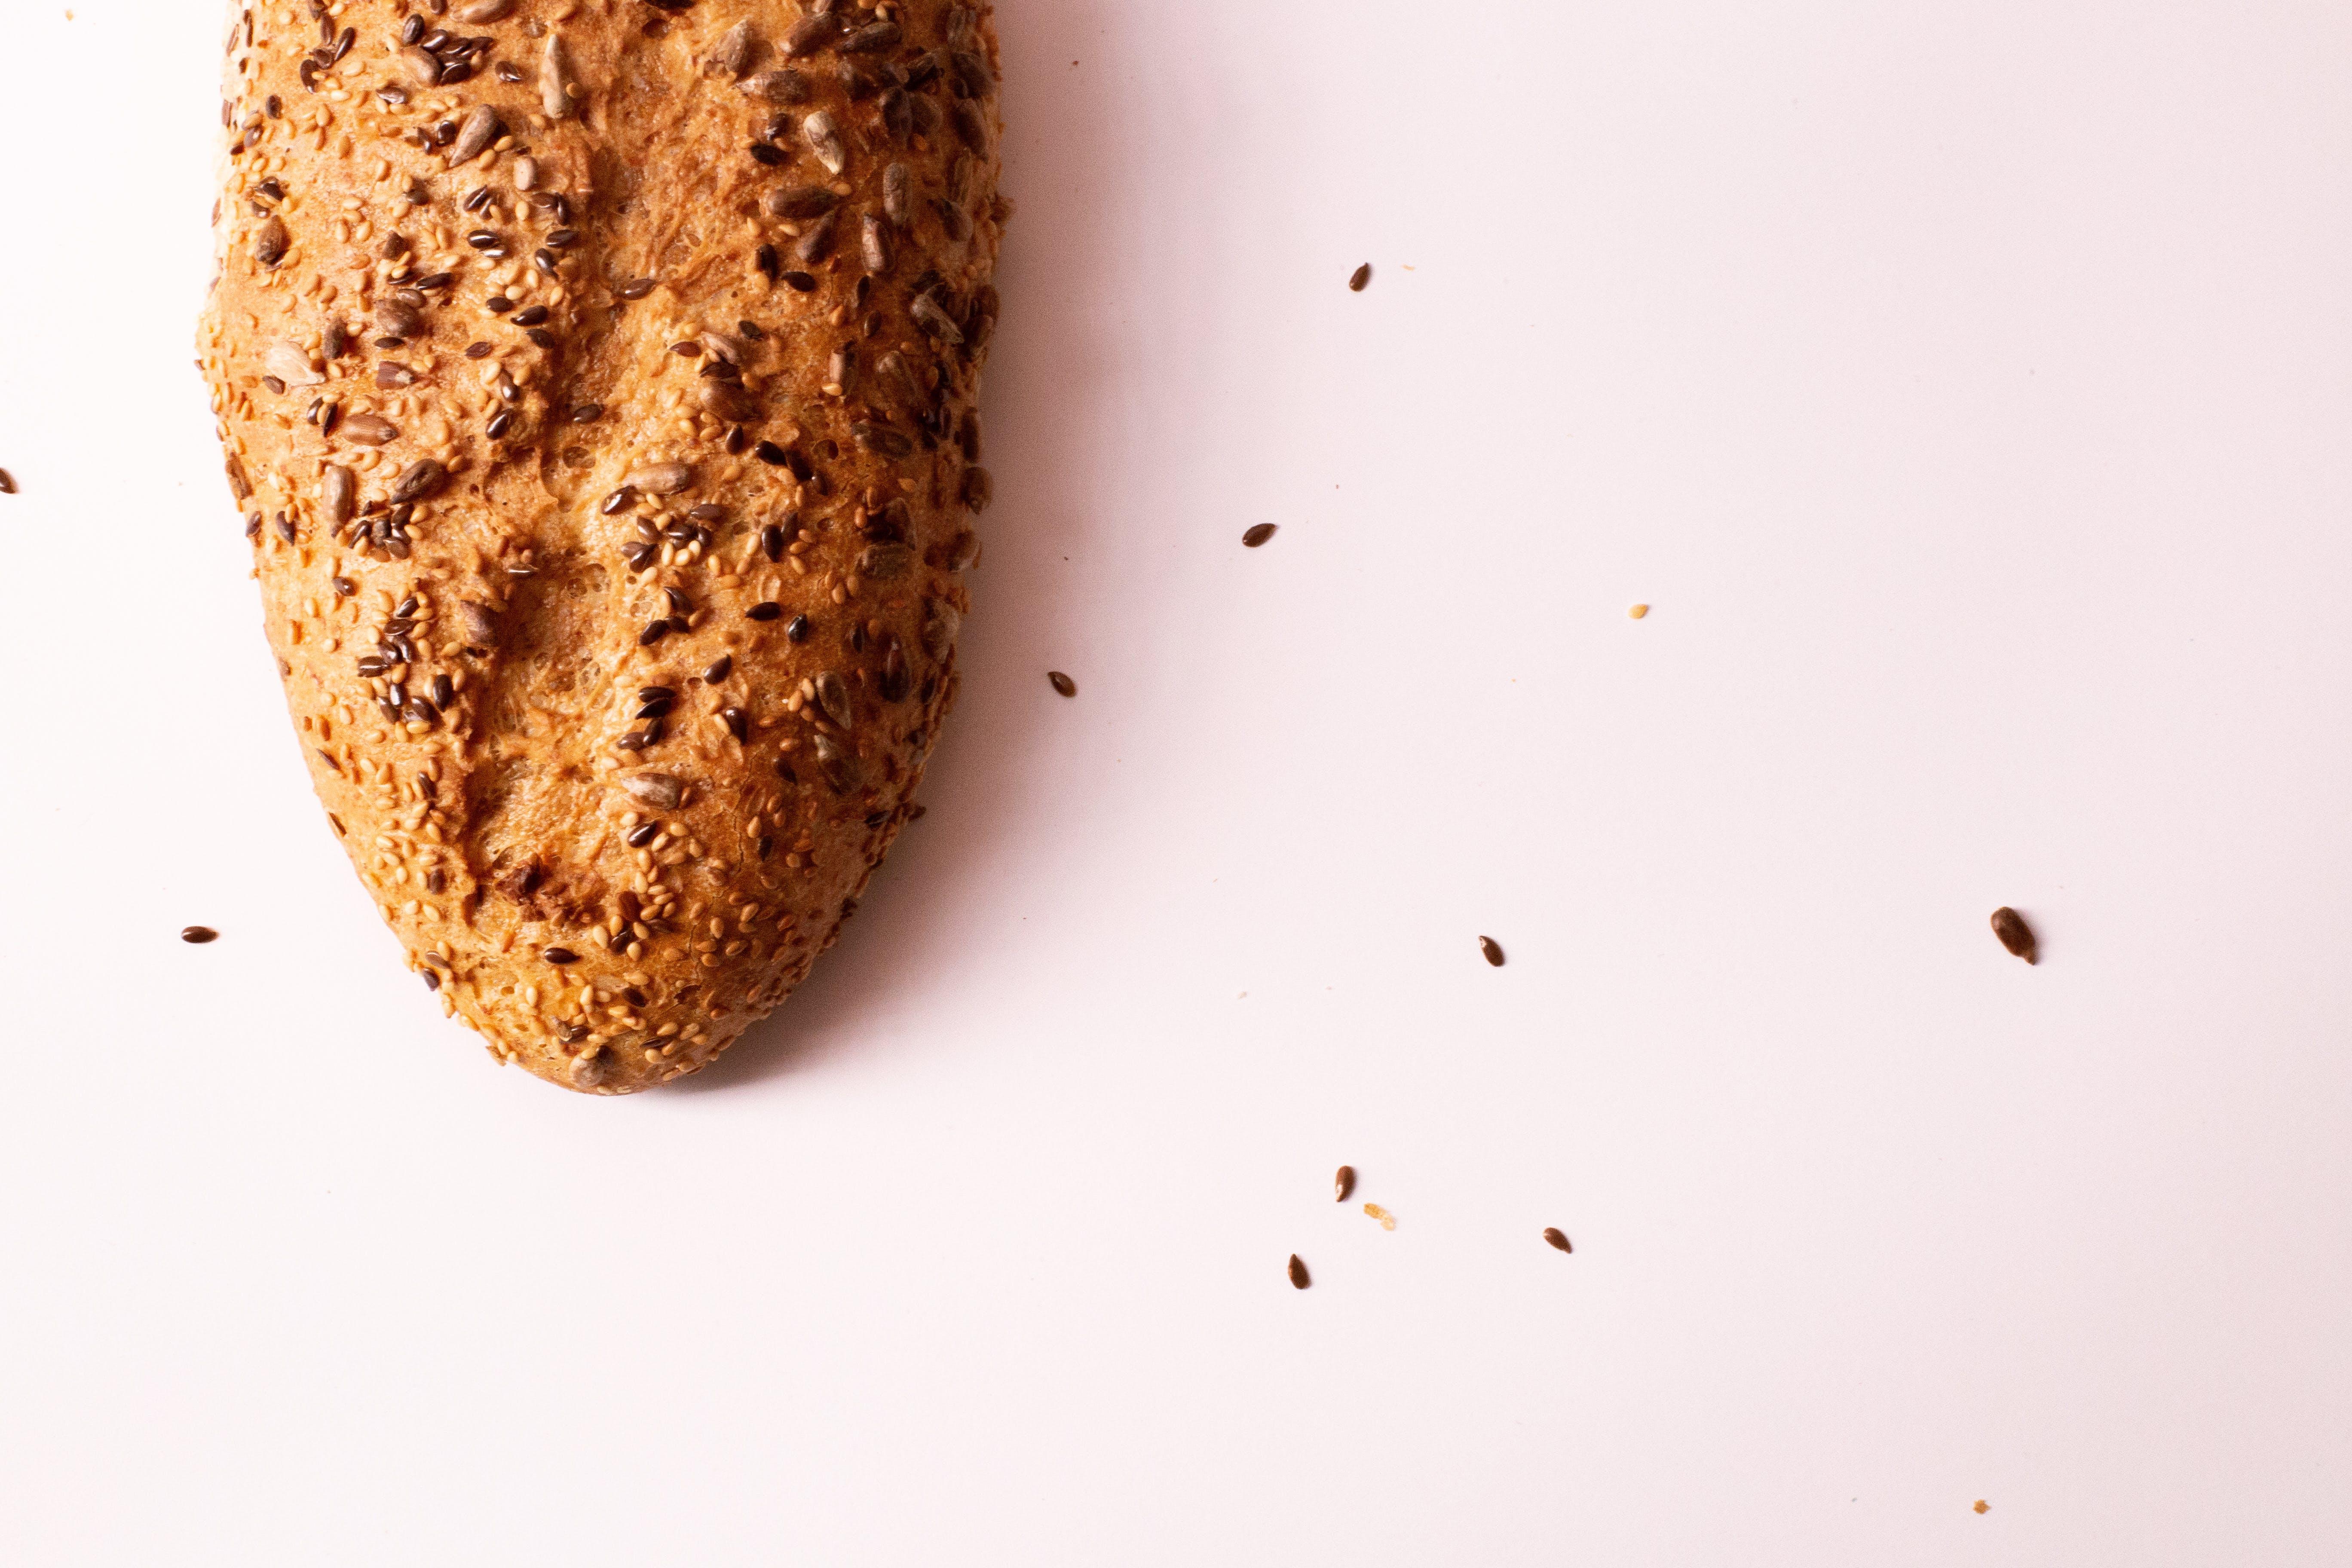 Kostenloses Stock Foto zu bäckerei, brot, essen, gebäck